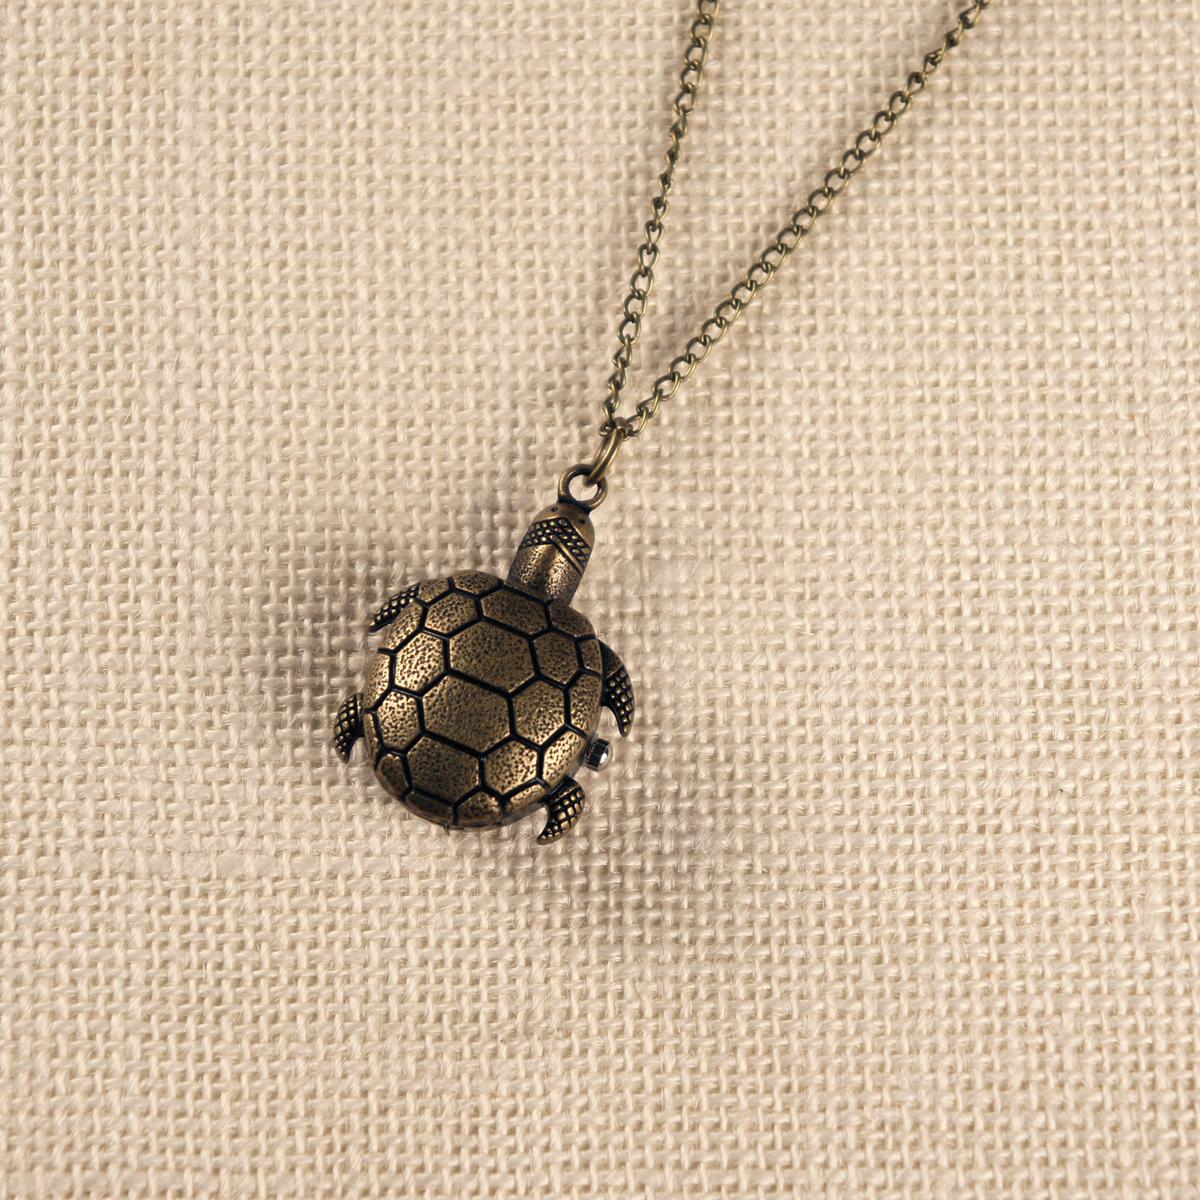 Кулон-часы Черепашка. ANTIK-055 ( ANTIK-055 )